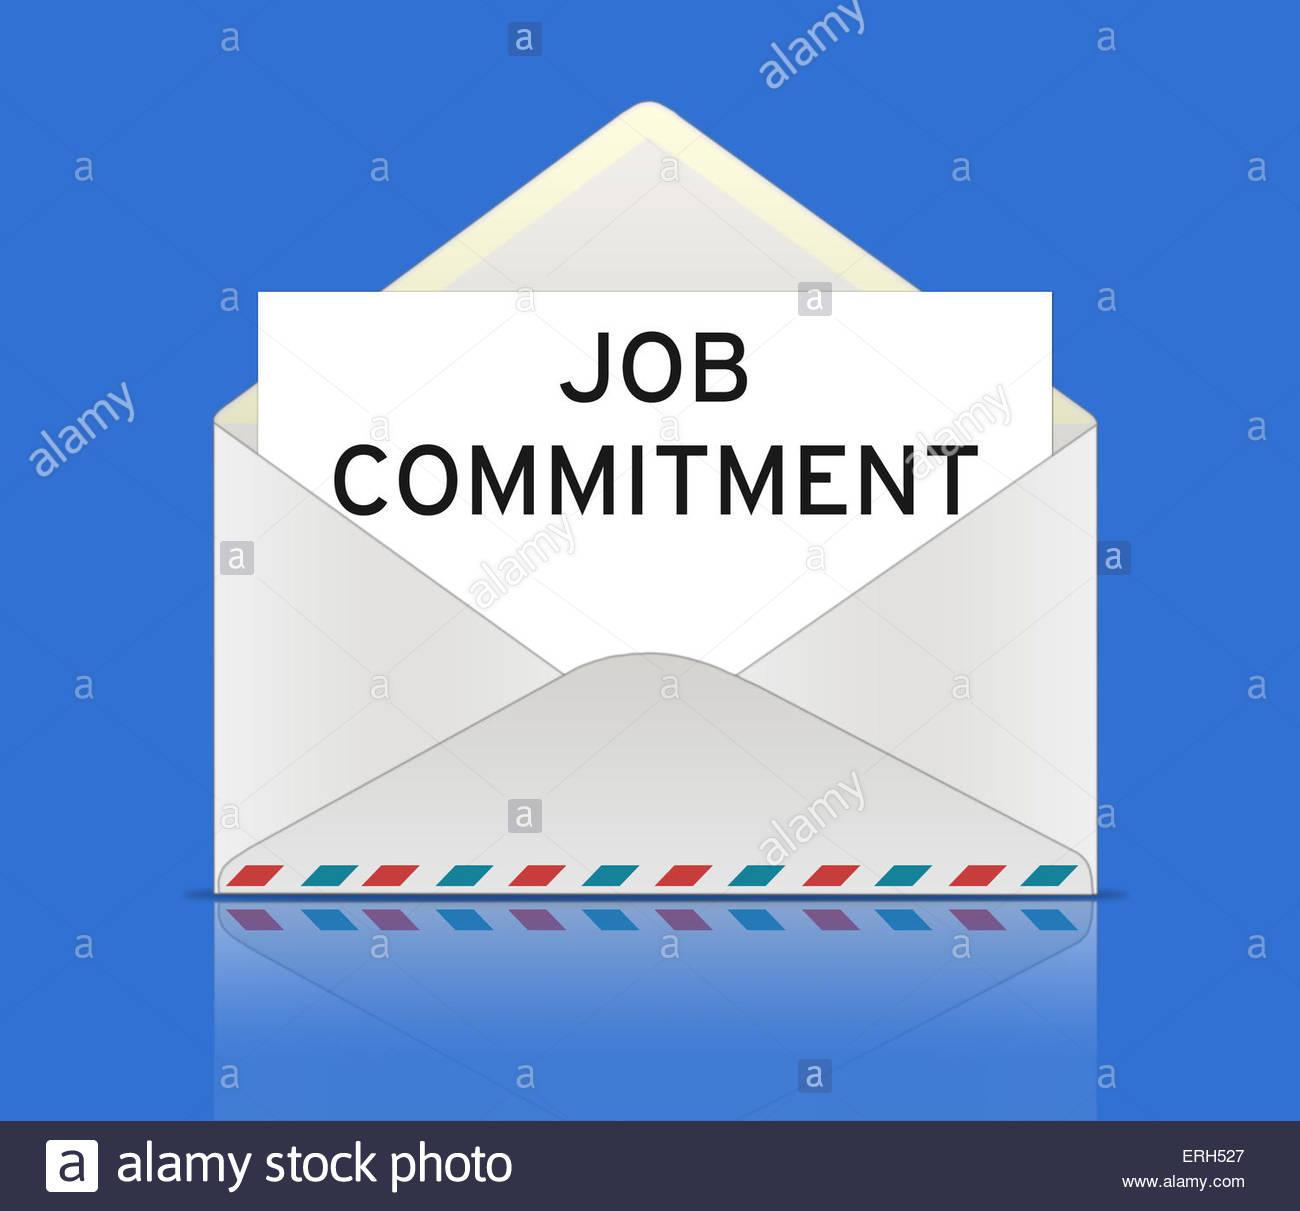 Job Commitment - Stock Image